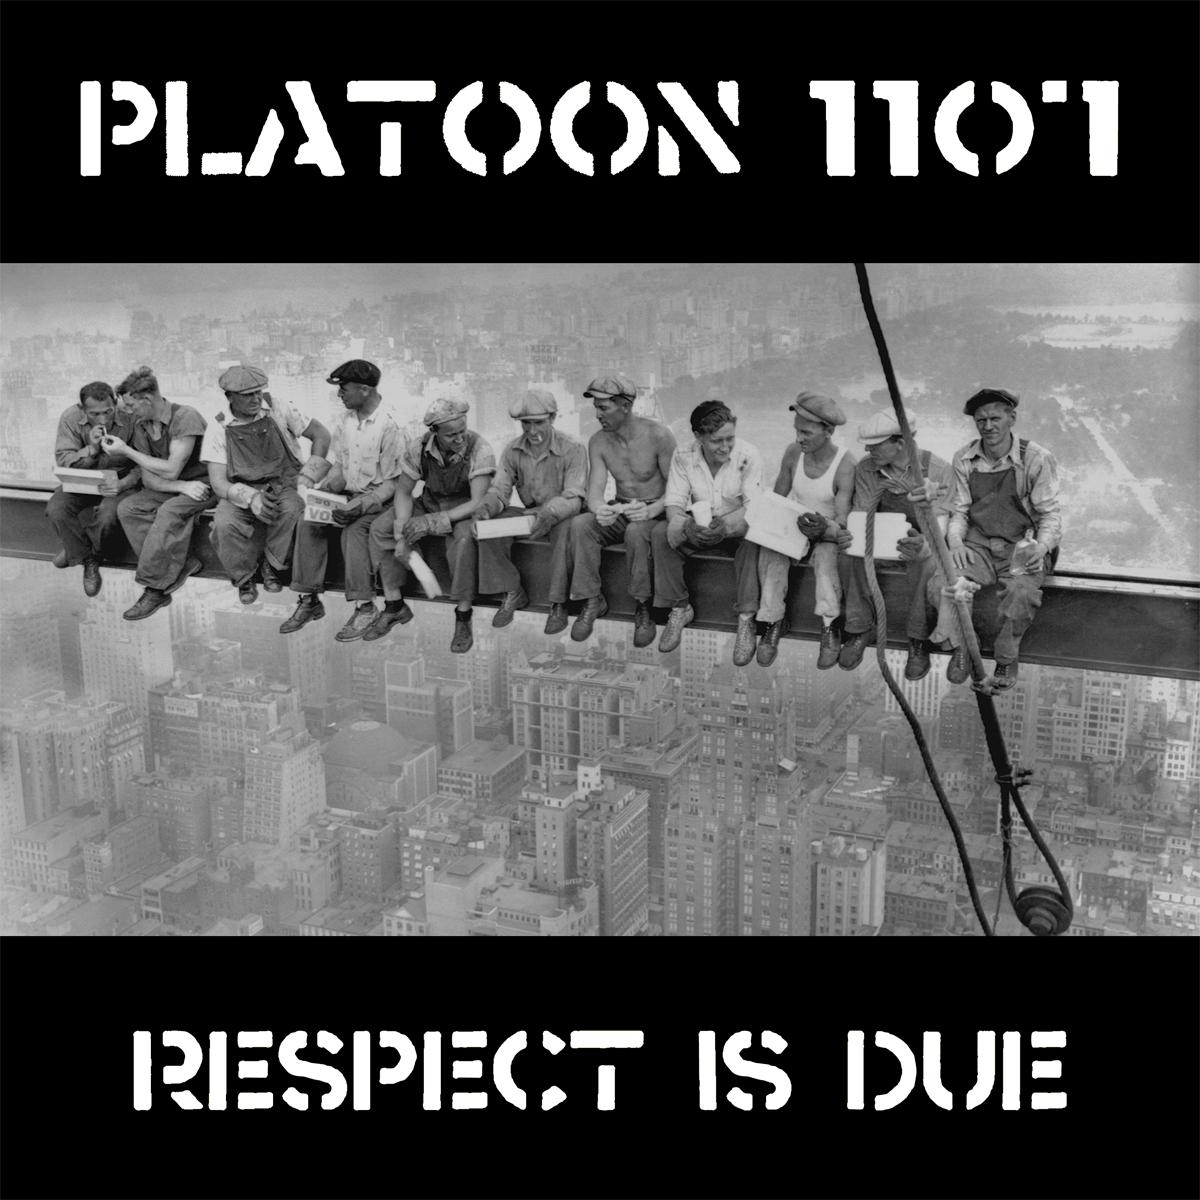 Platoon1107-coversEP-coverartmedium.jpg